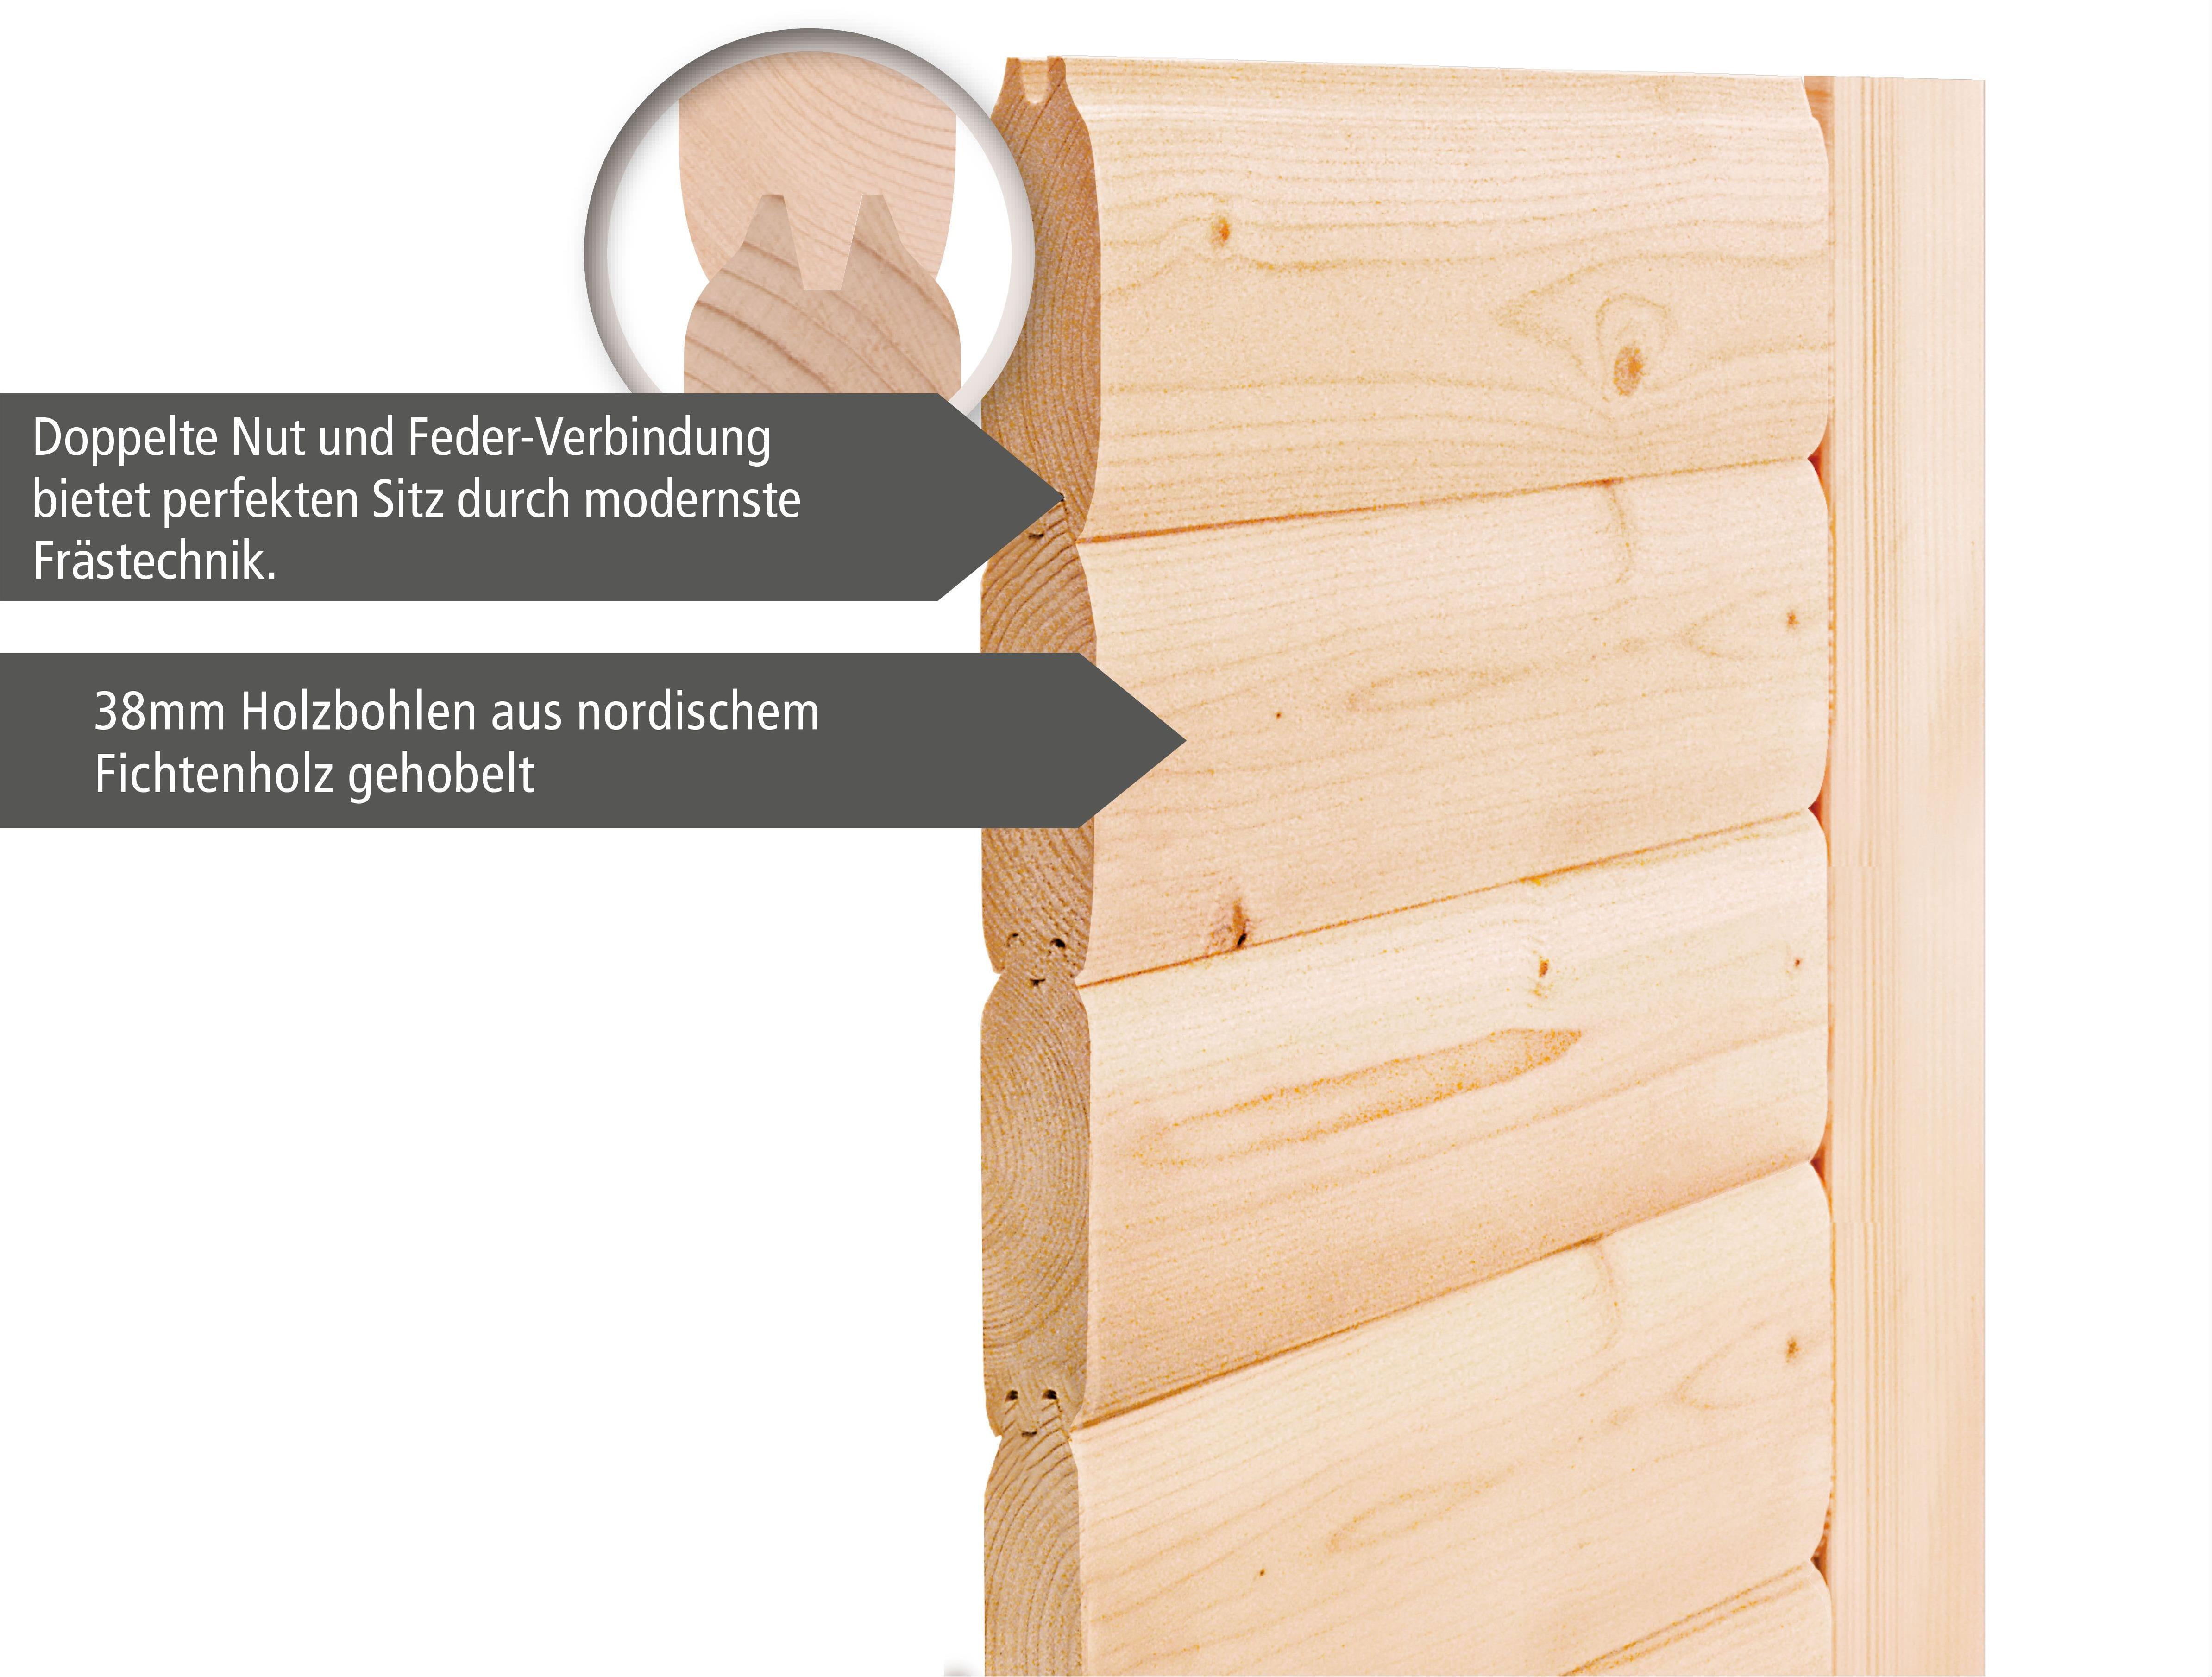 Woodfeeling Sauna Karla 38mm Kranz Ofen 9kW extern Tür Holz Bild 5